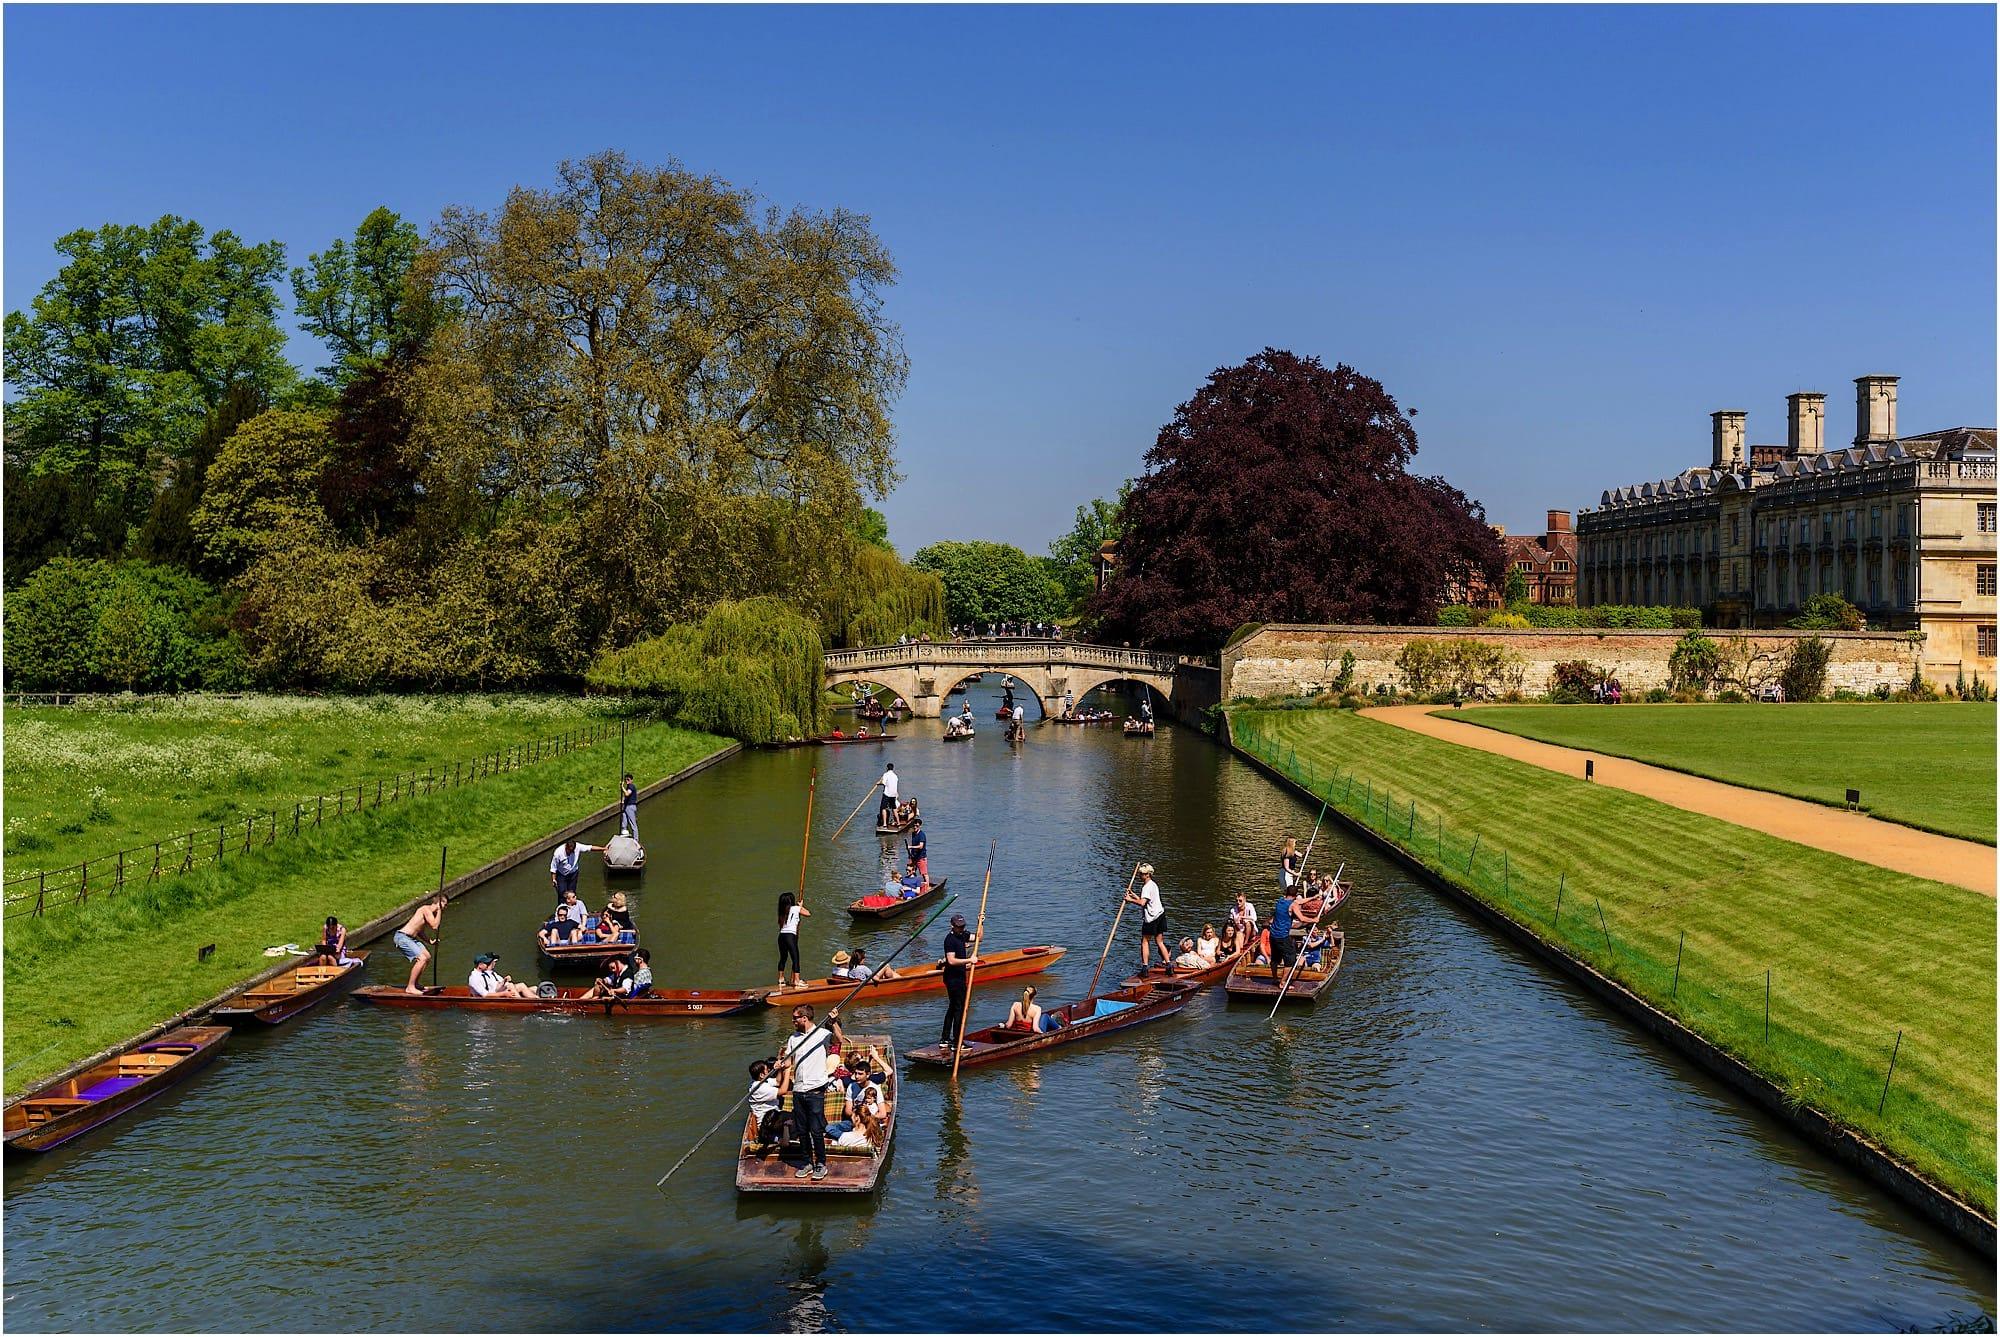 Kings College Cambridge bridge